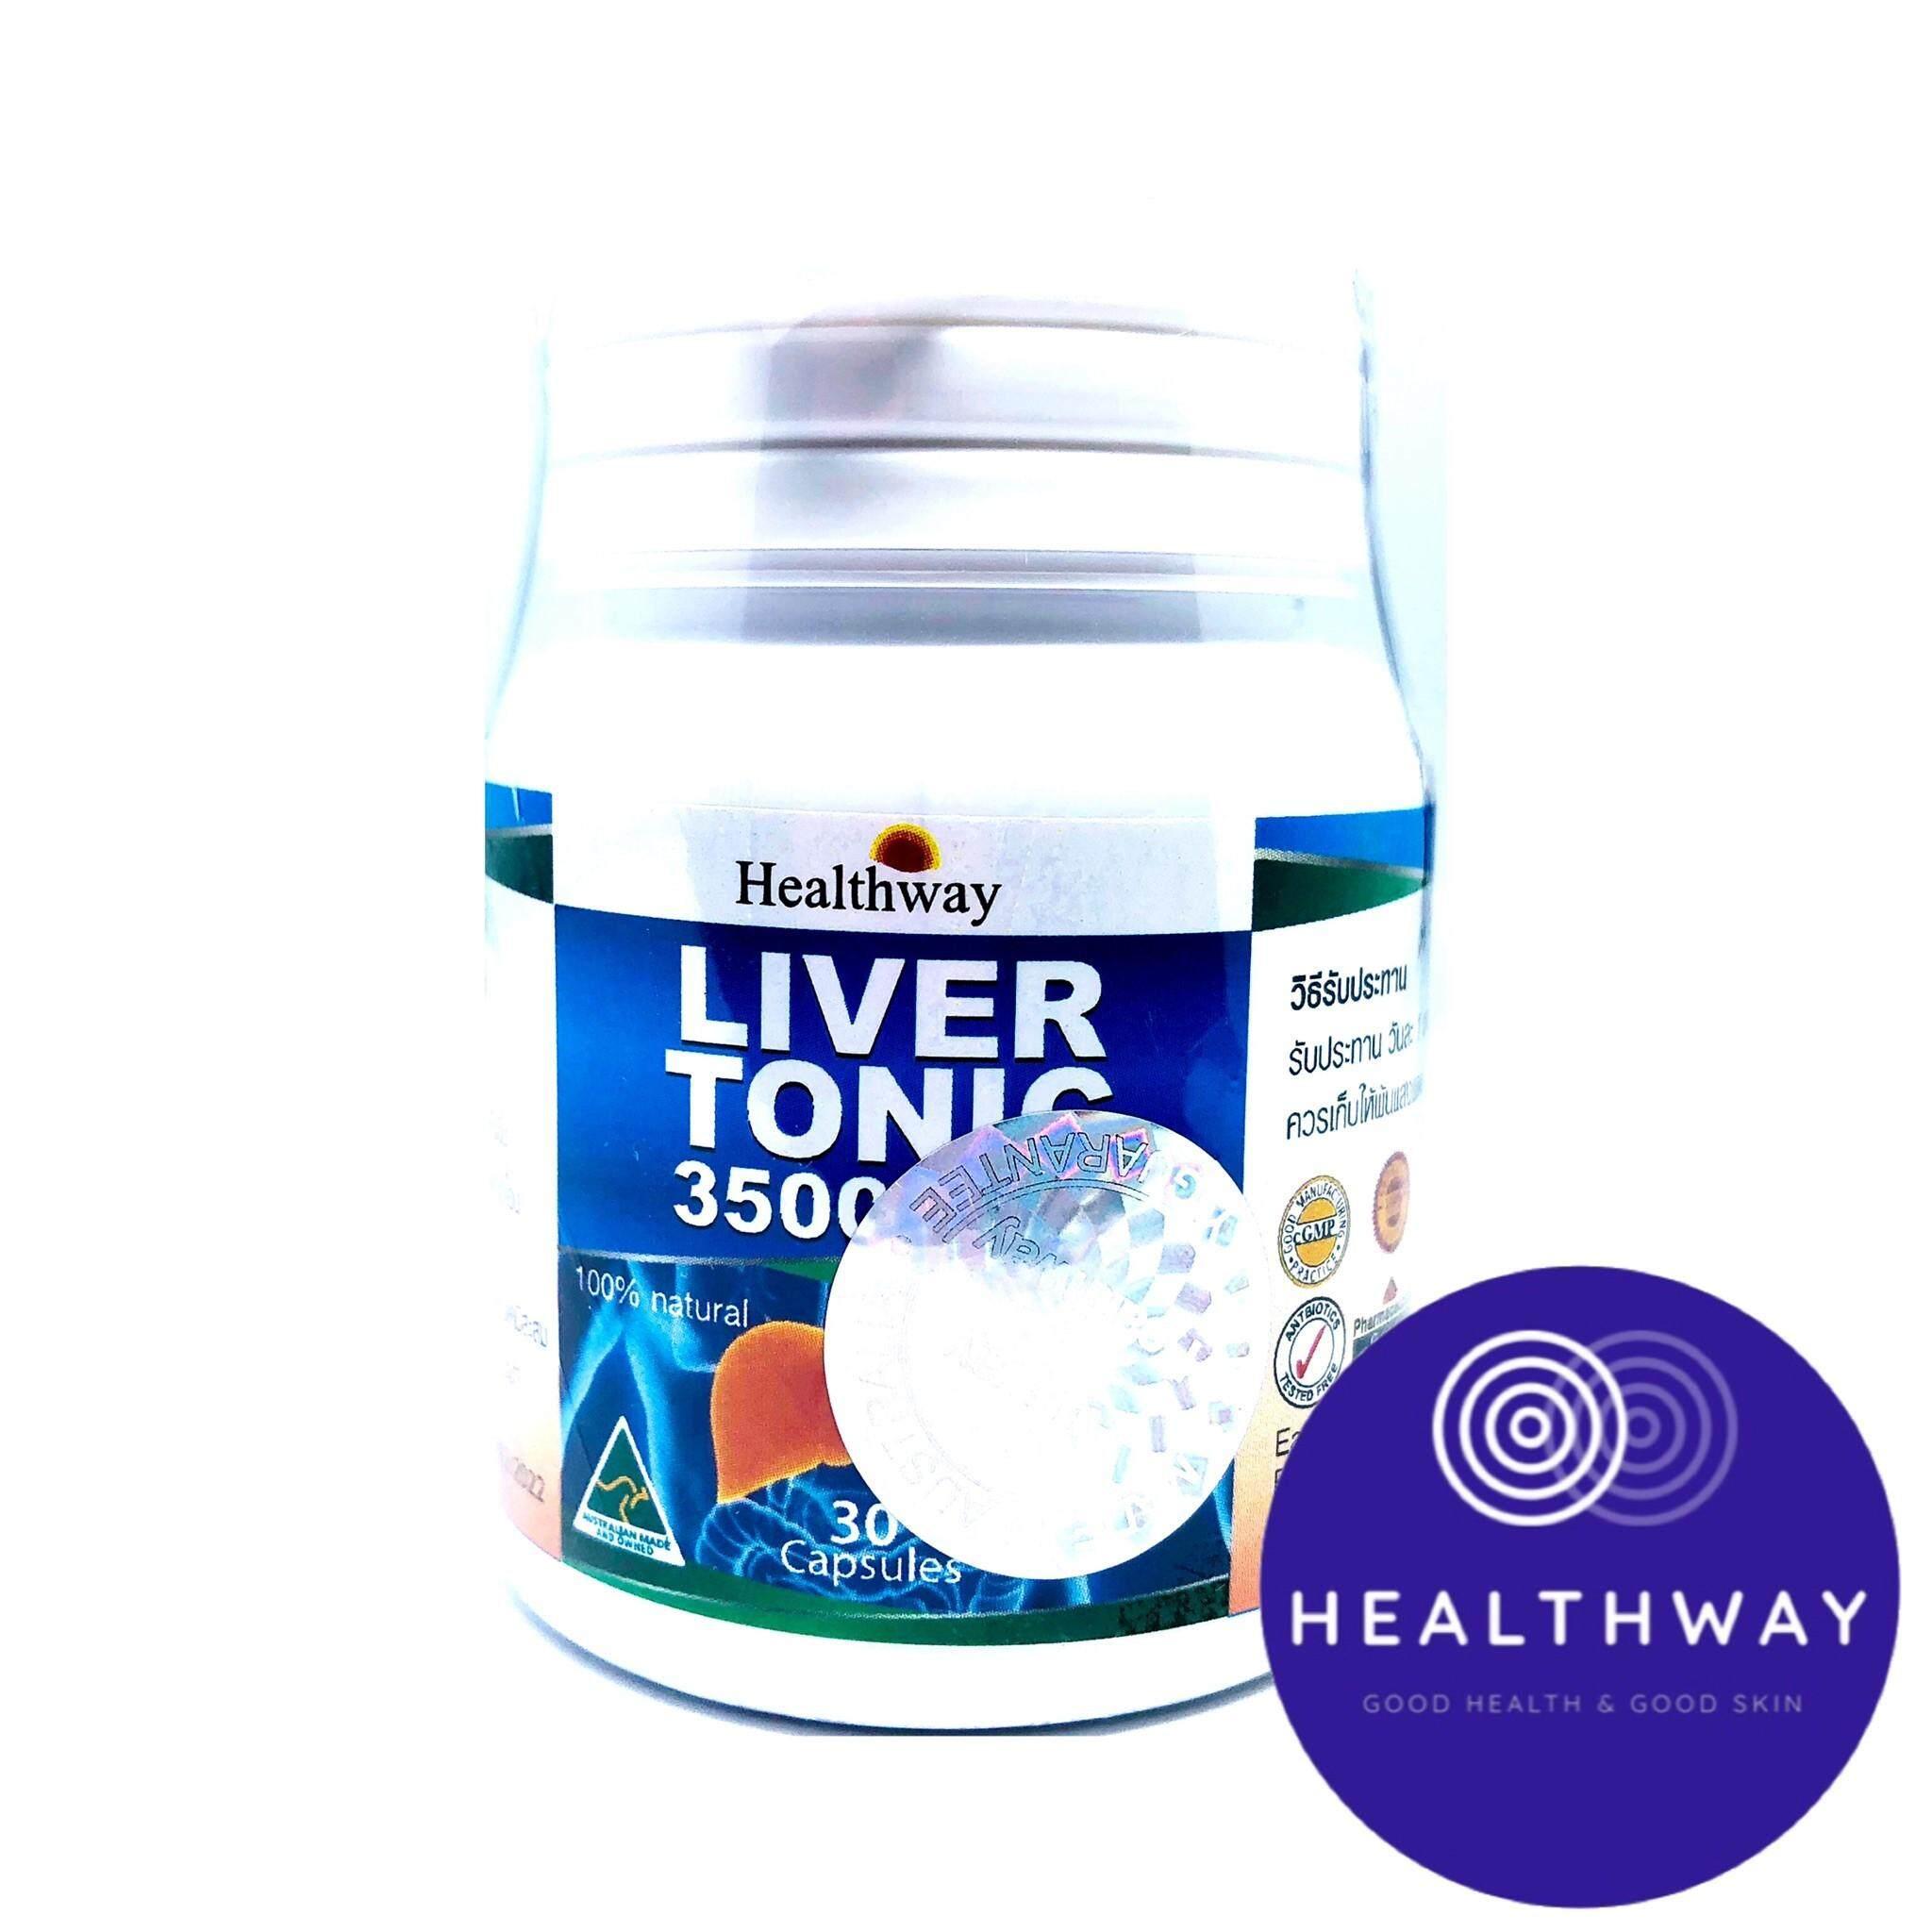 Healthway Liver Tonic 35,000 Mg Milk Thistle 35000mg. เข้มข้นที่สุดในขณะนี้ (กระปุกมินิ 30 เม็ด).